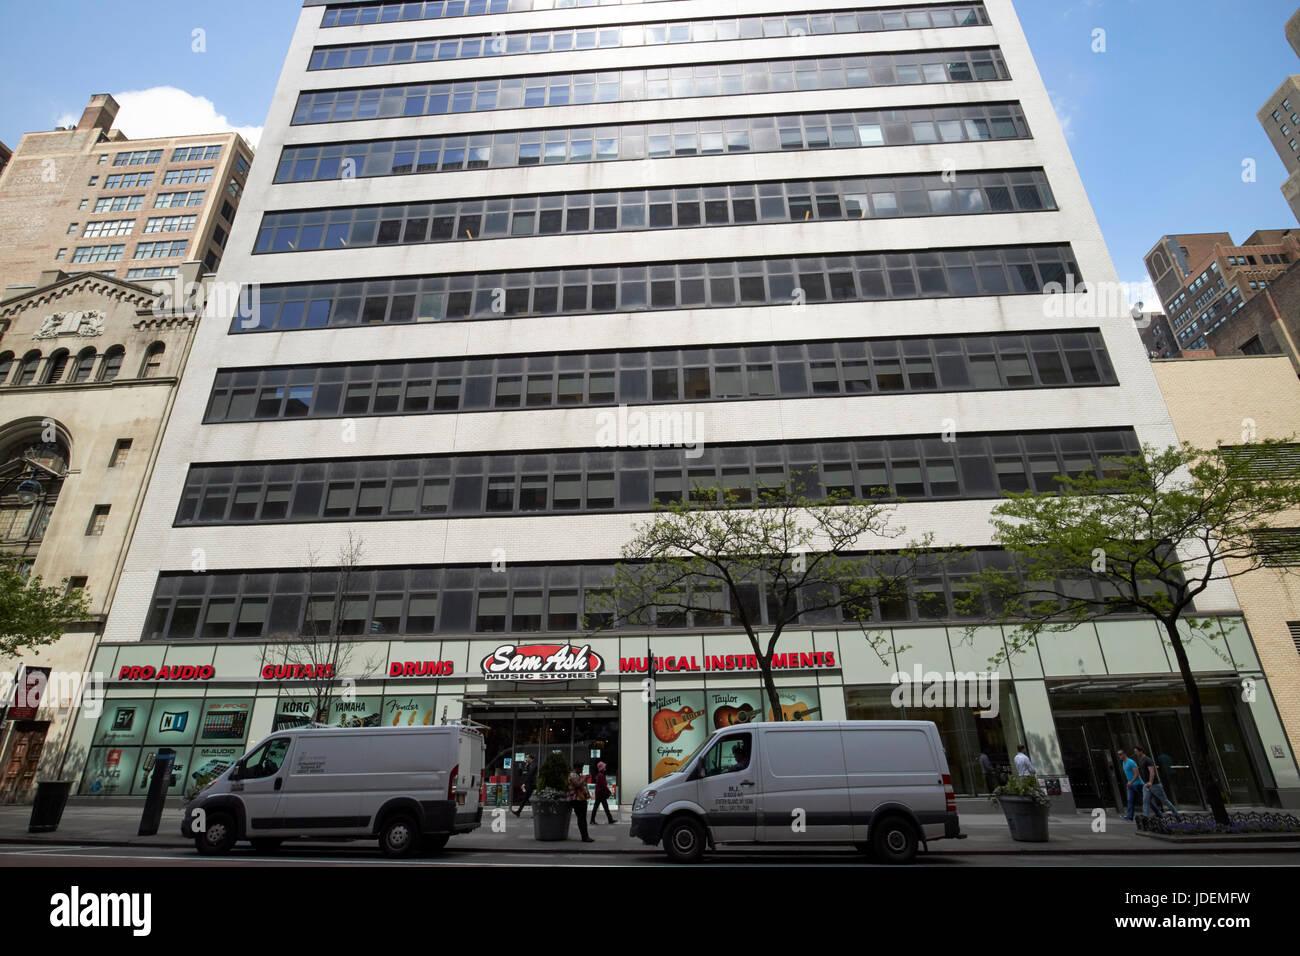 Sam Ash music stores store New York City USA - Stock Image